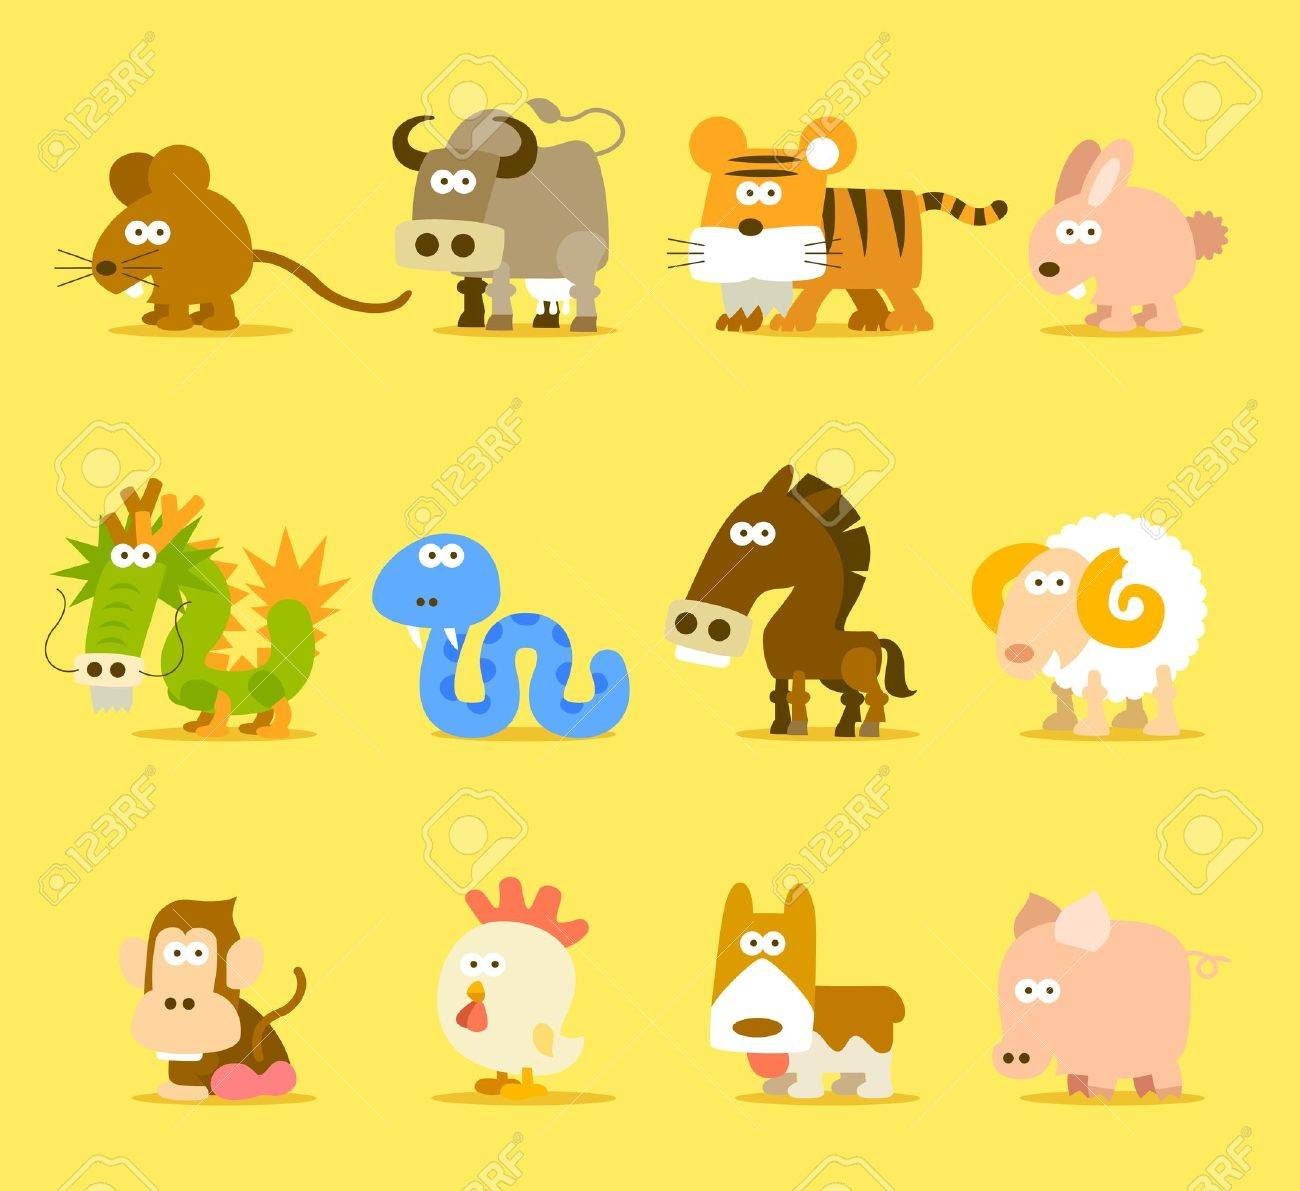 Chinese Zodiac animal ,12 animal icon set Stock Vector - 11810233